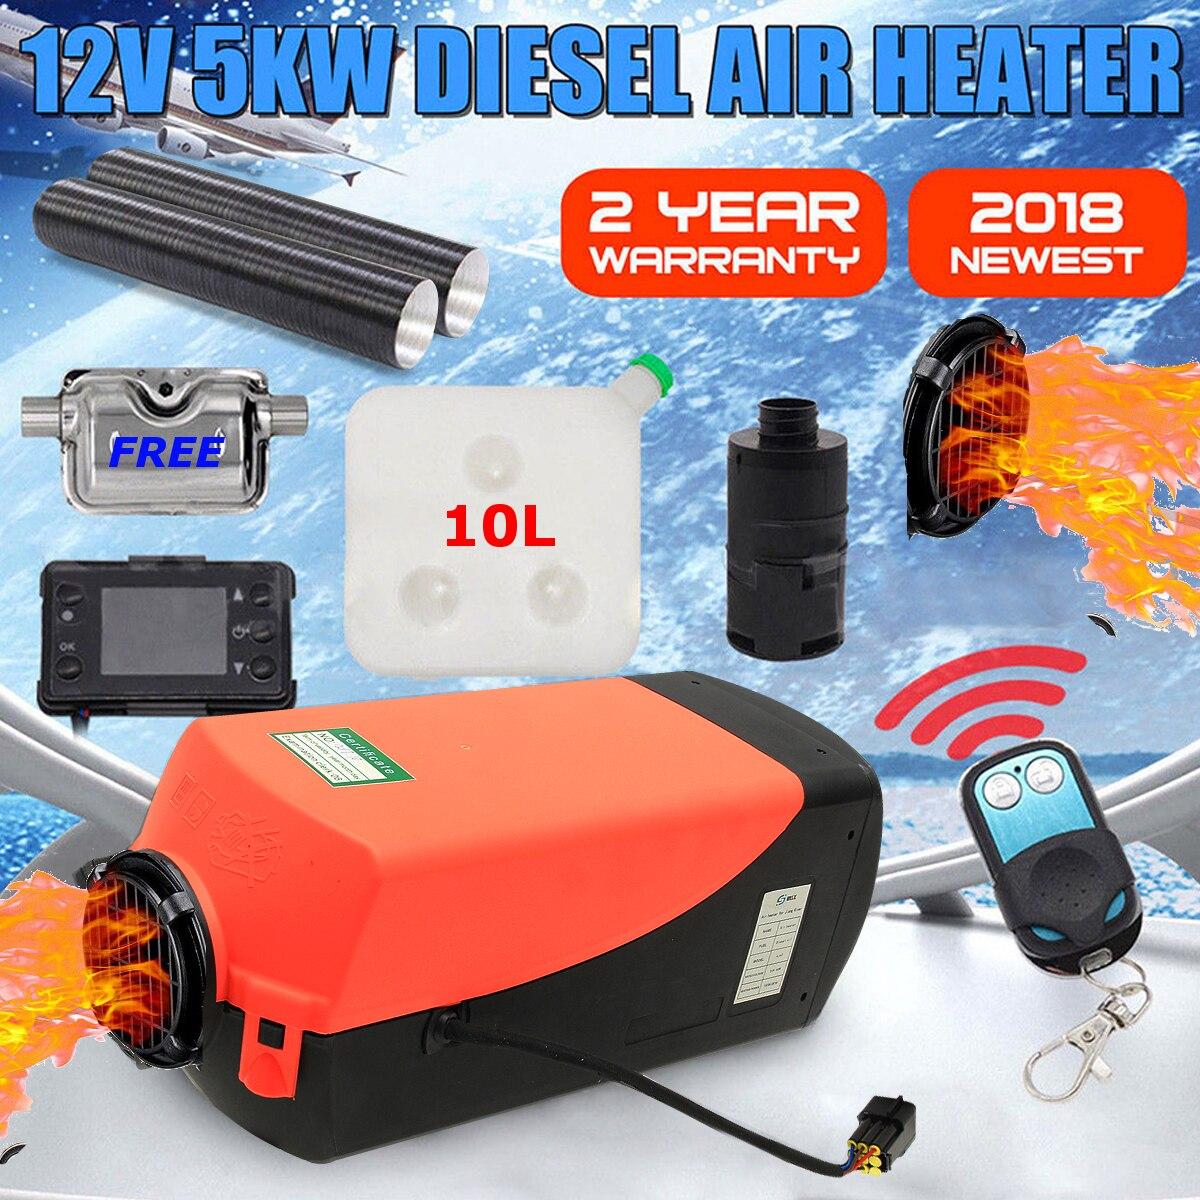 12 V 12 V 5000 W LCD Monitor de aire diesel calentador de combustible solo agujero 5KW para barcos autobús calentador de coche con control remoto control y silenciador para libre